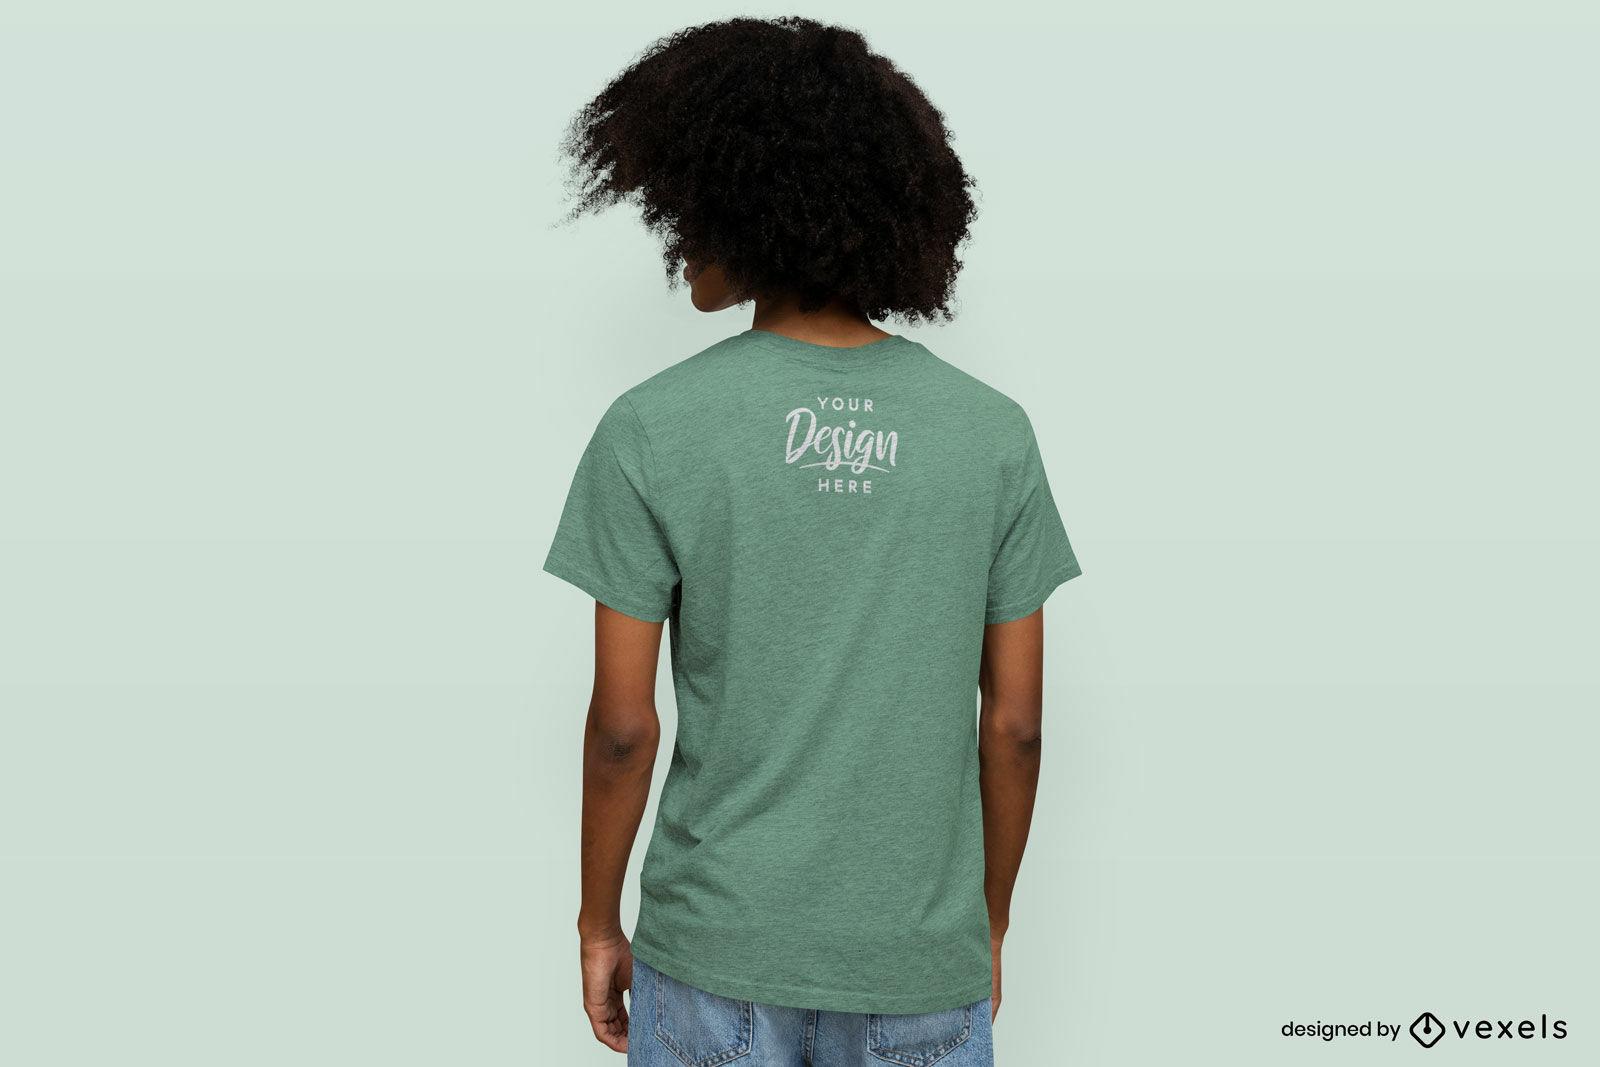 Man backwards in solid background t-shirt mockup